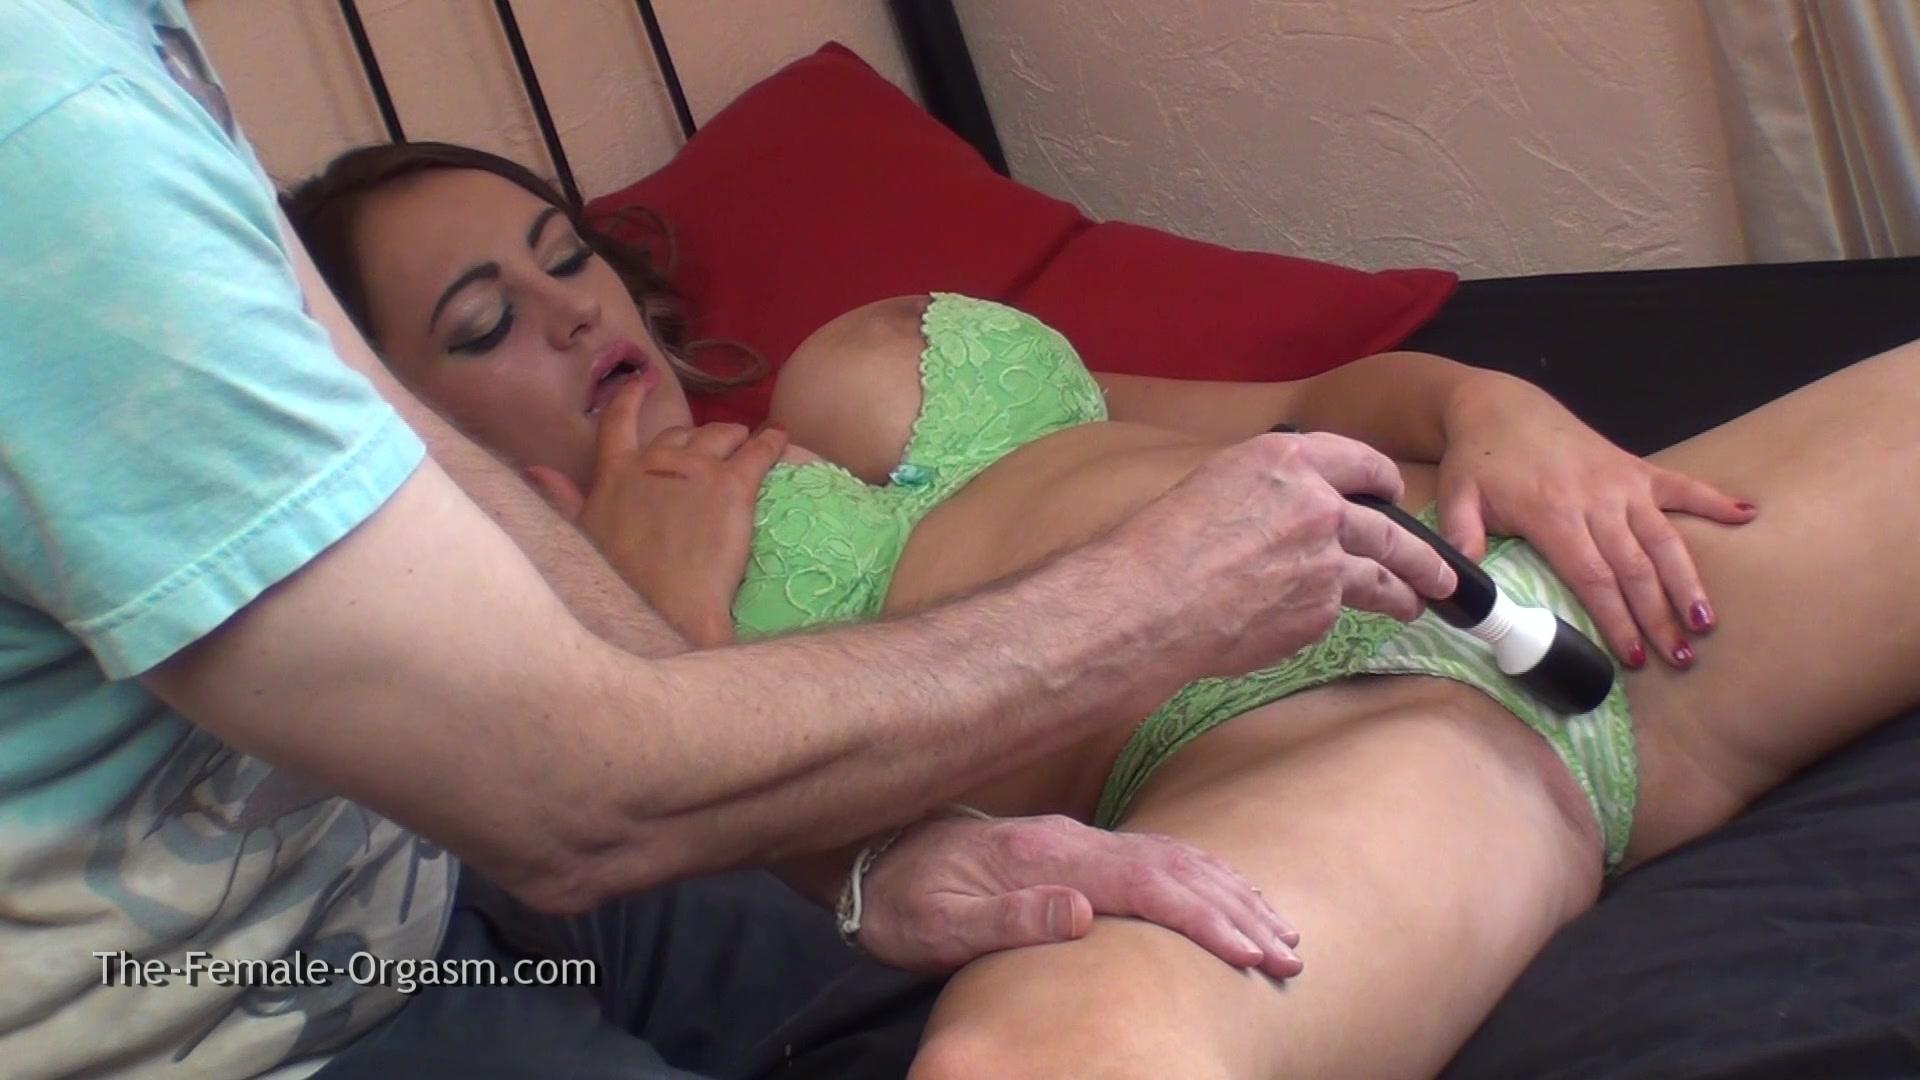 Pussy orgasm photo porno gratis